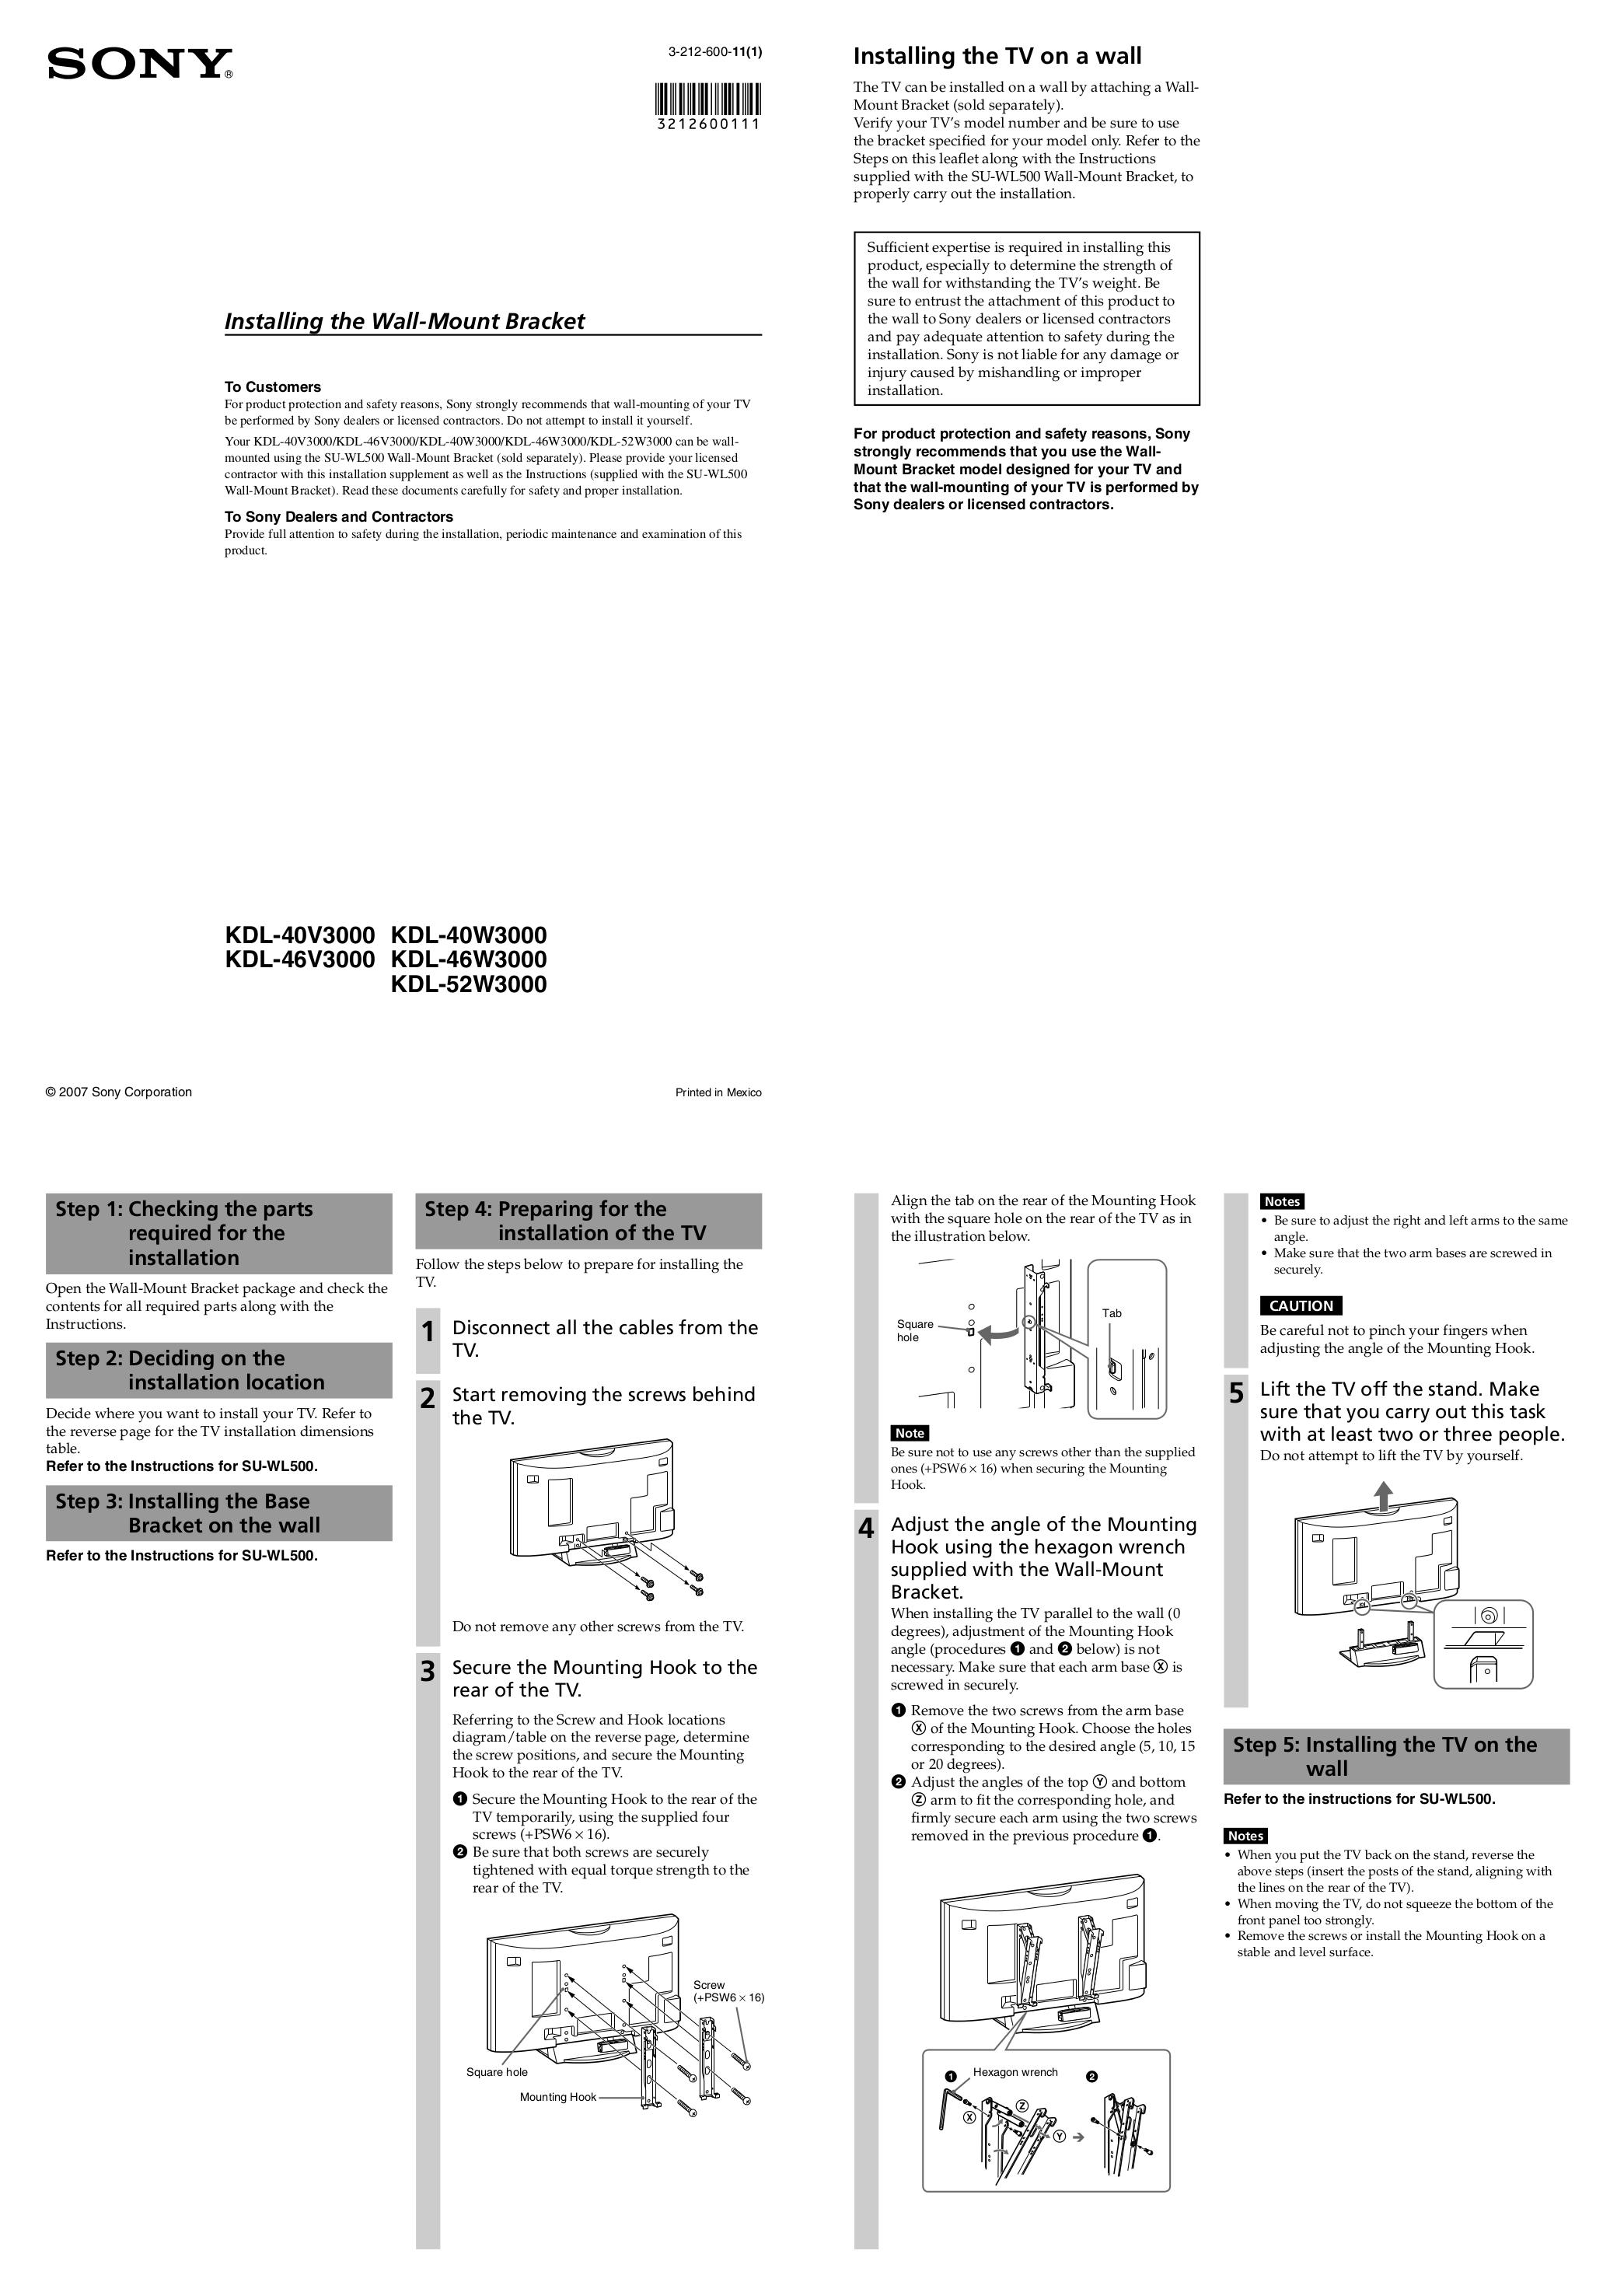 Download Free Pdf For Sony Bravia Kdl 40w3000 Tv Manual